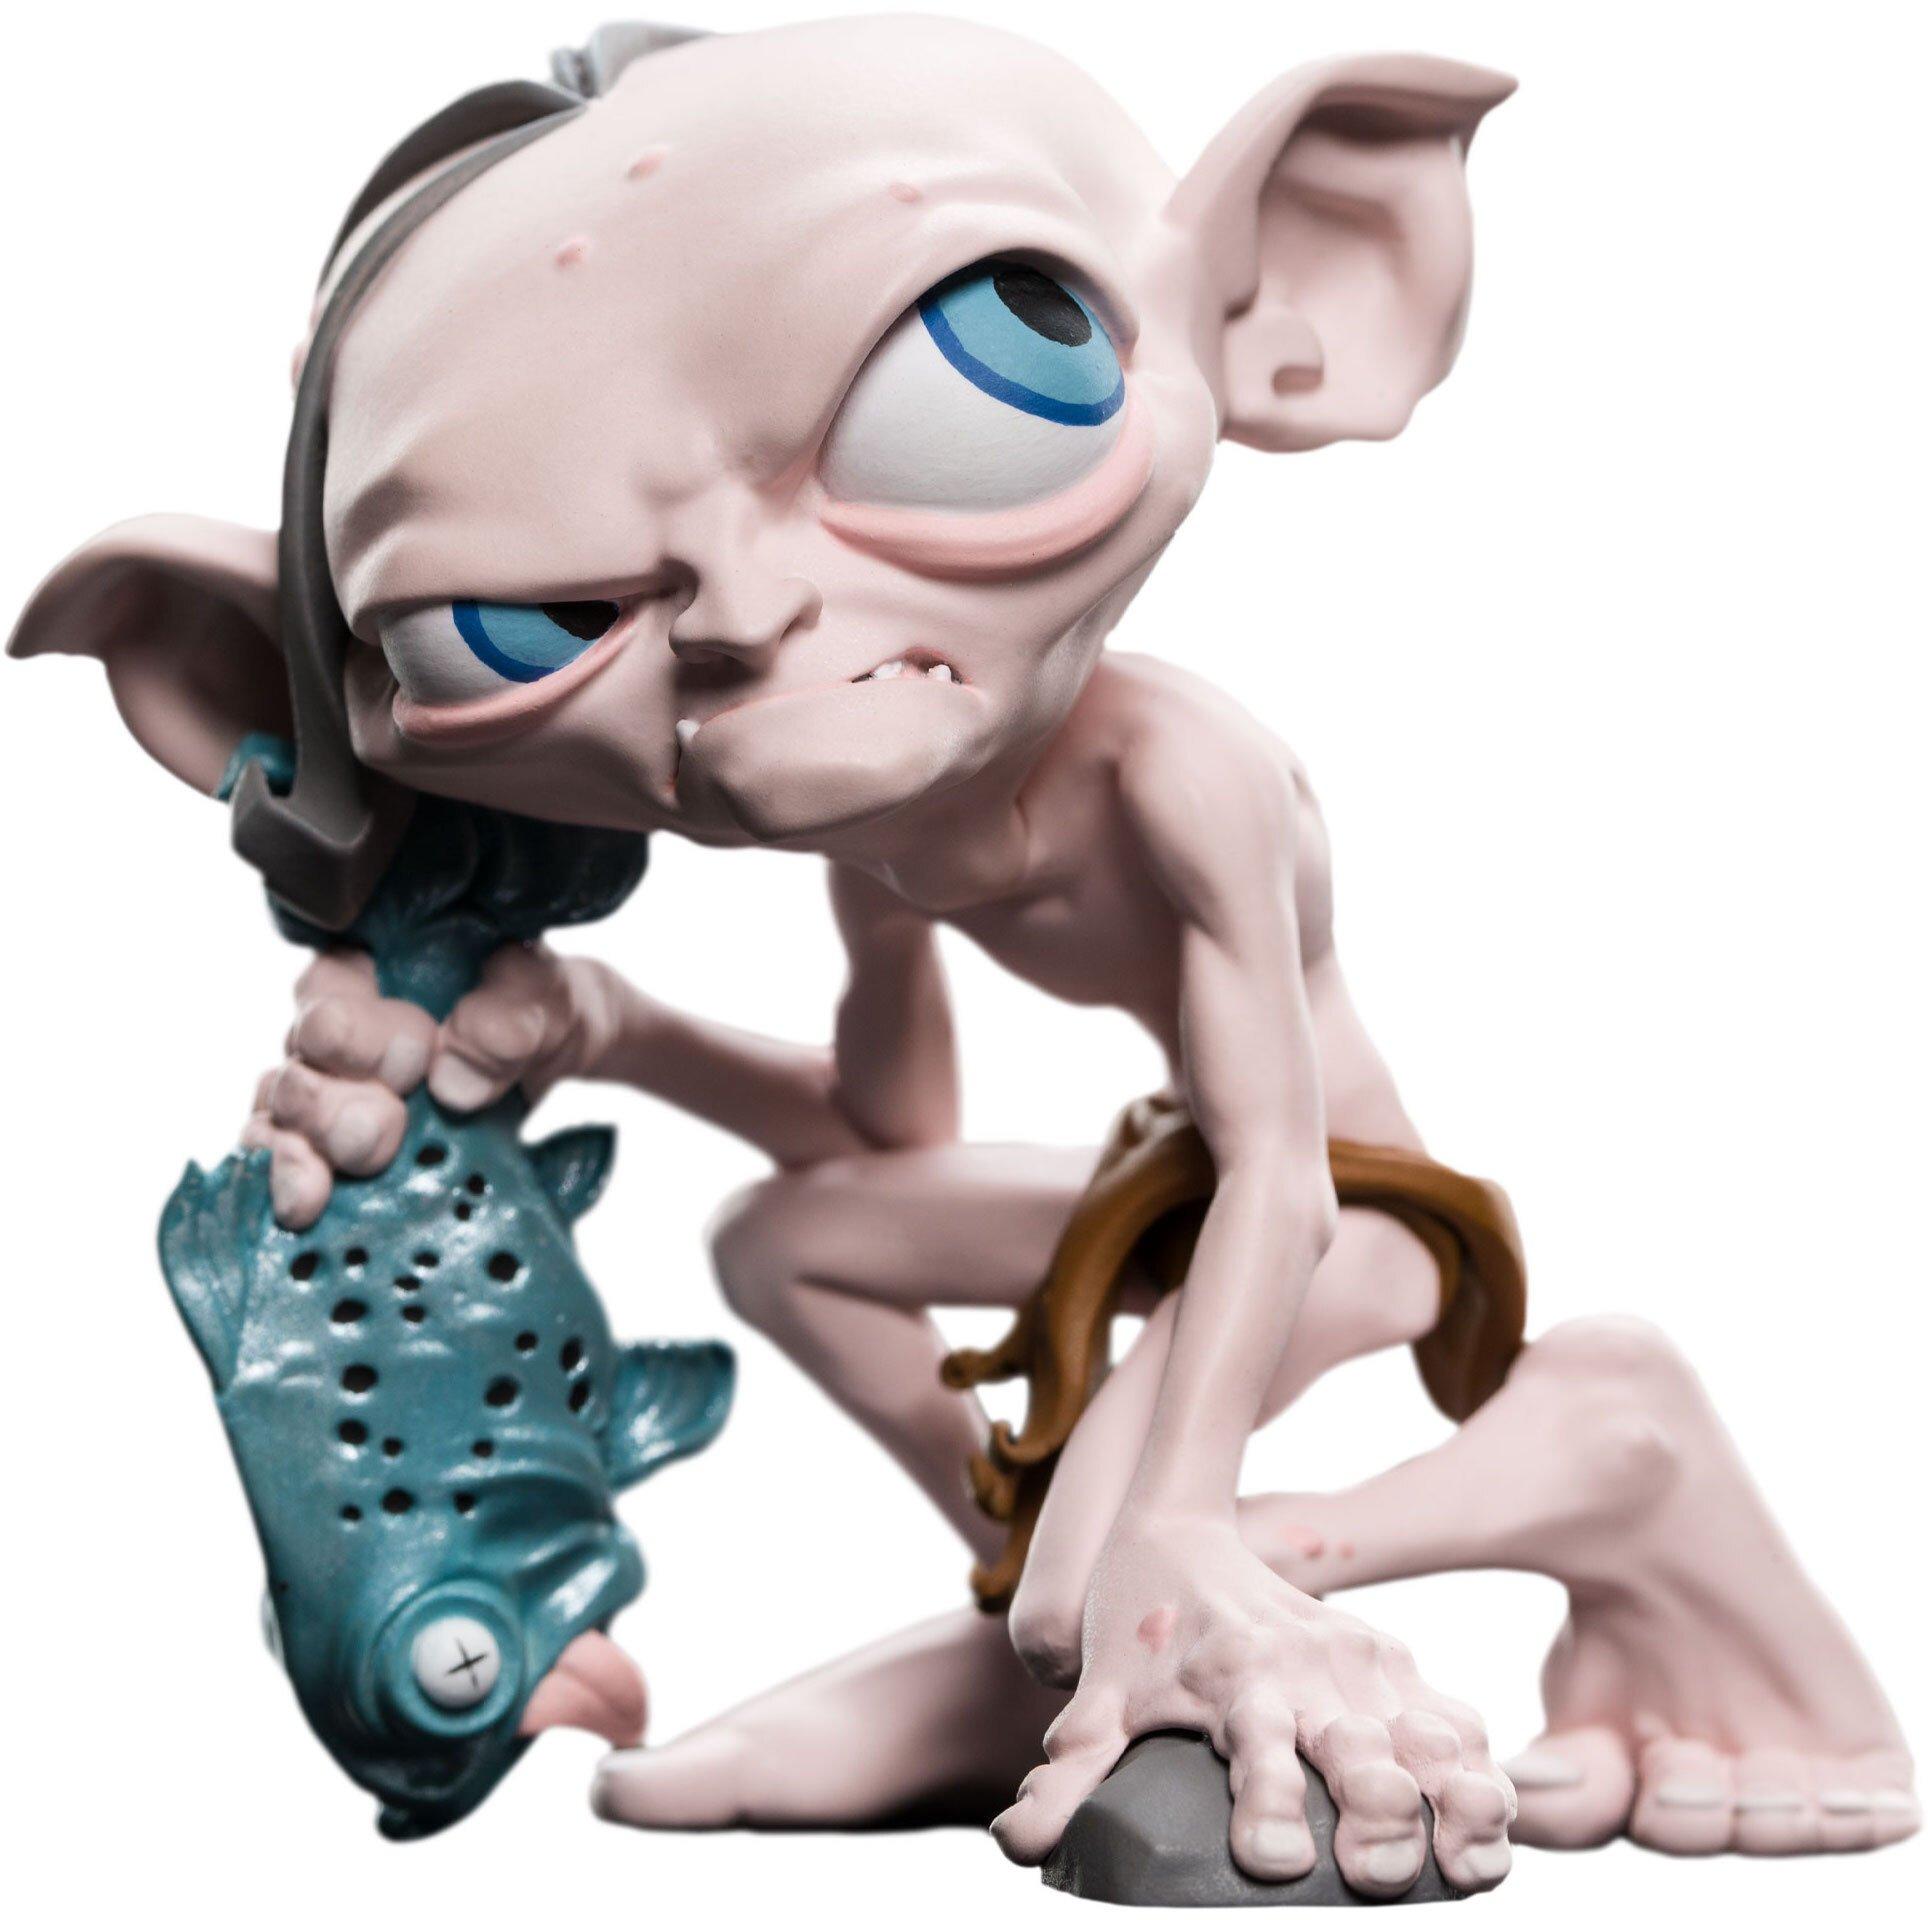 Lord of the Rings Mini Epics - Gollum